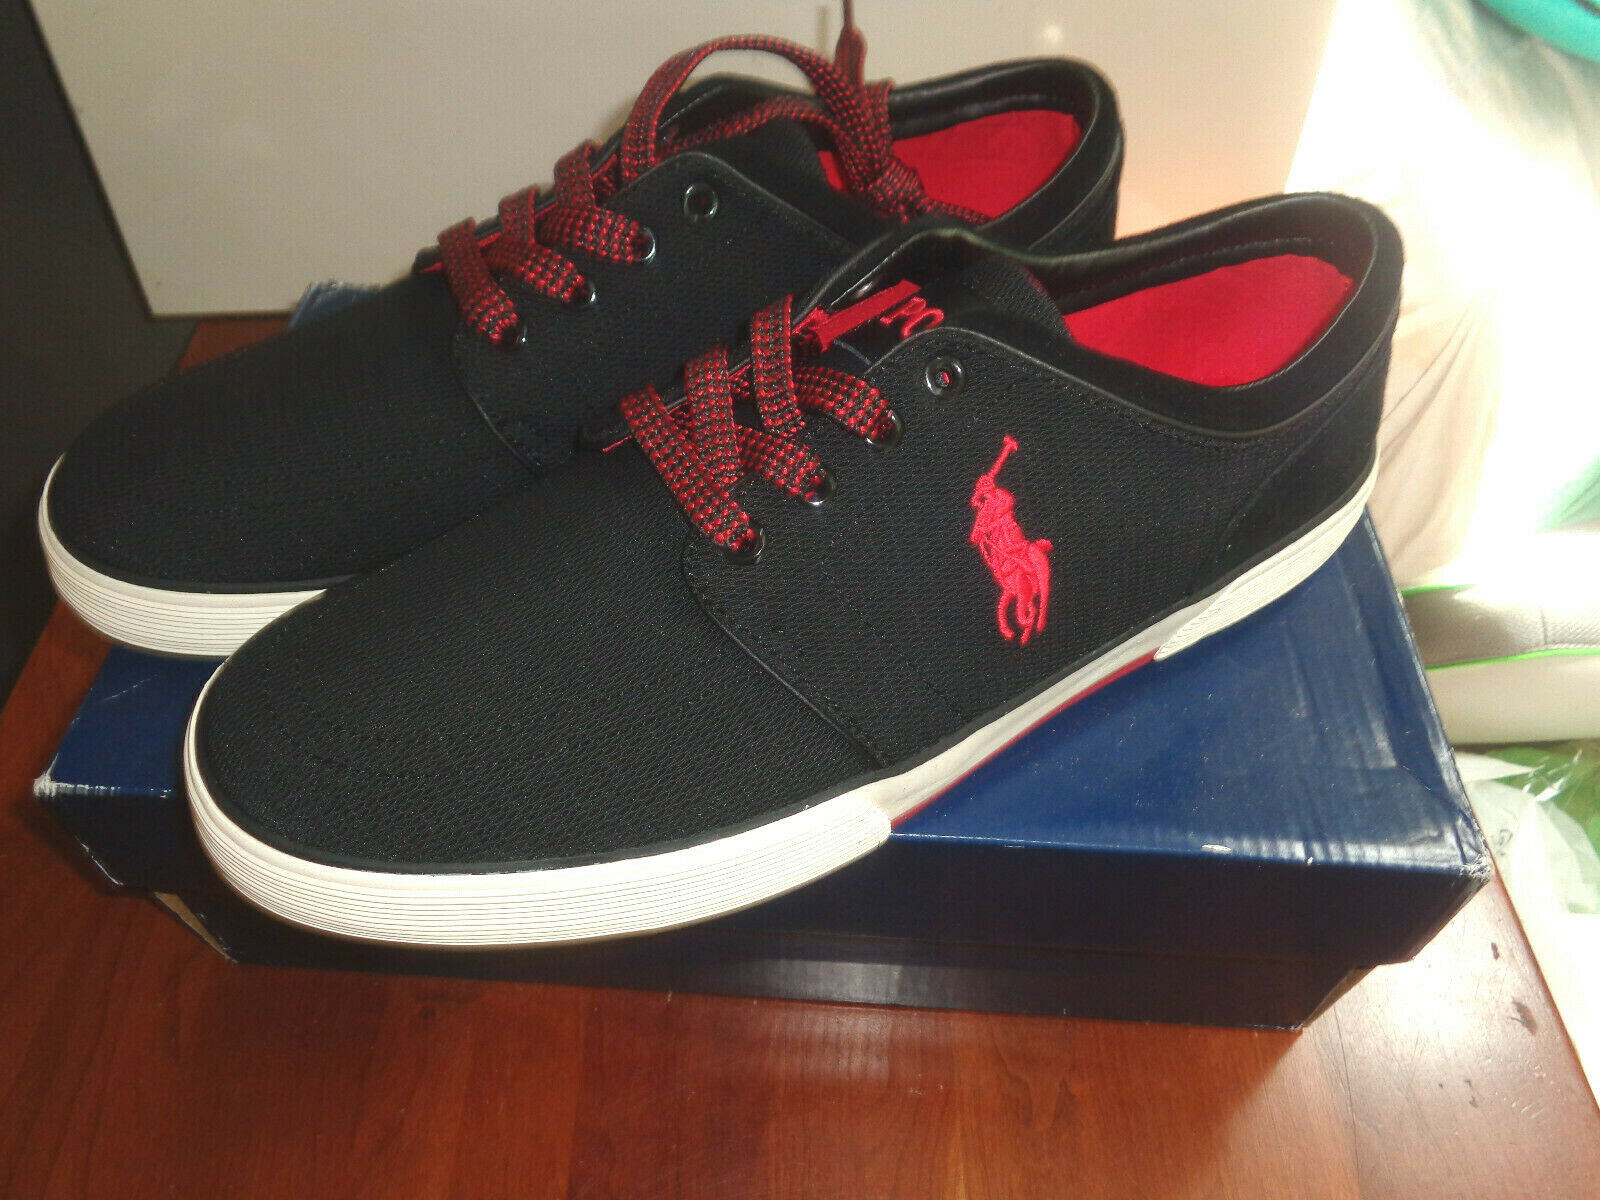 Polo Ralph Lauren Men's Faxon SK VLC Sneaker shoes boat NEW SIZE 13 M